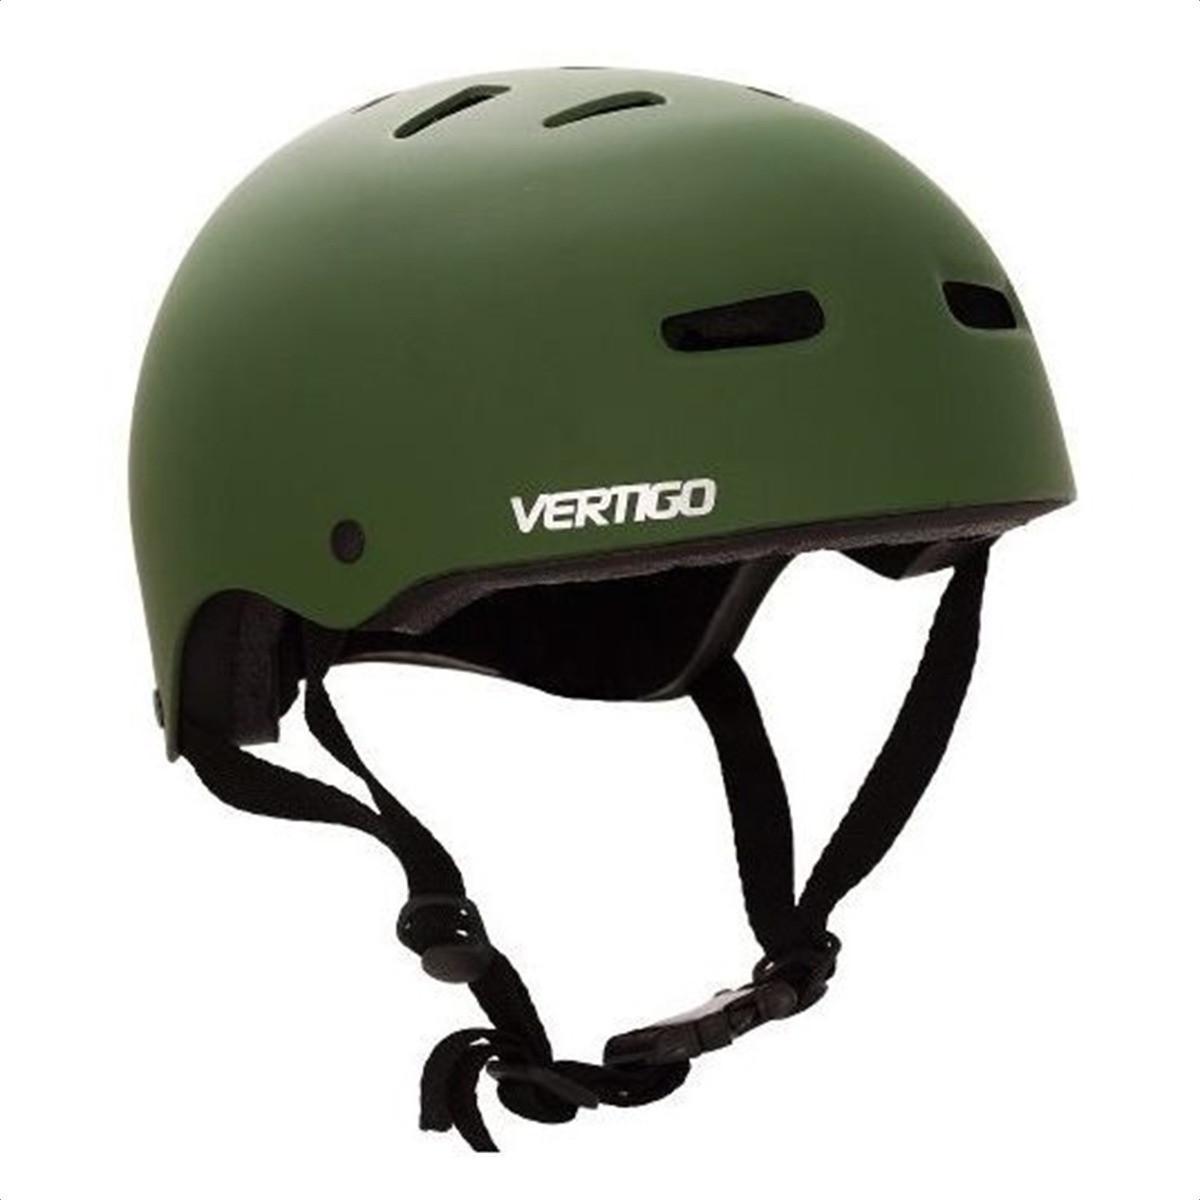 Casco Proteccion Bicicleta Vertigo Verde